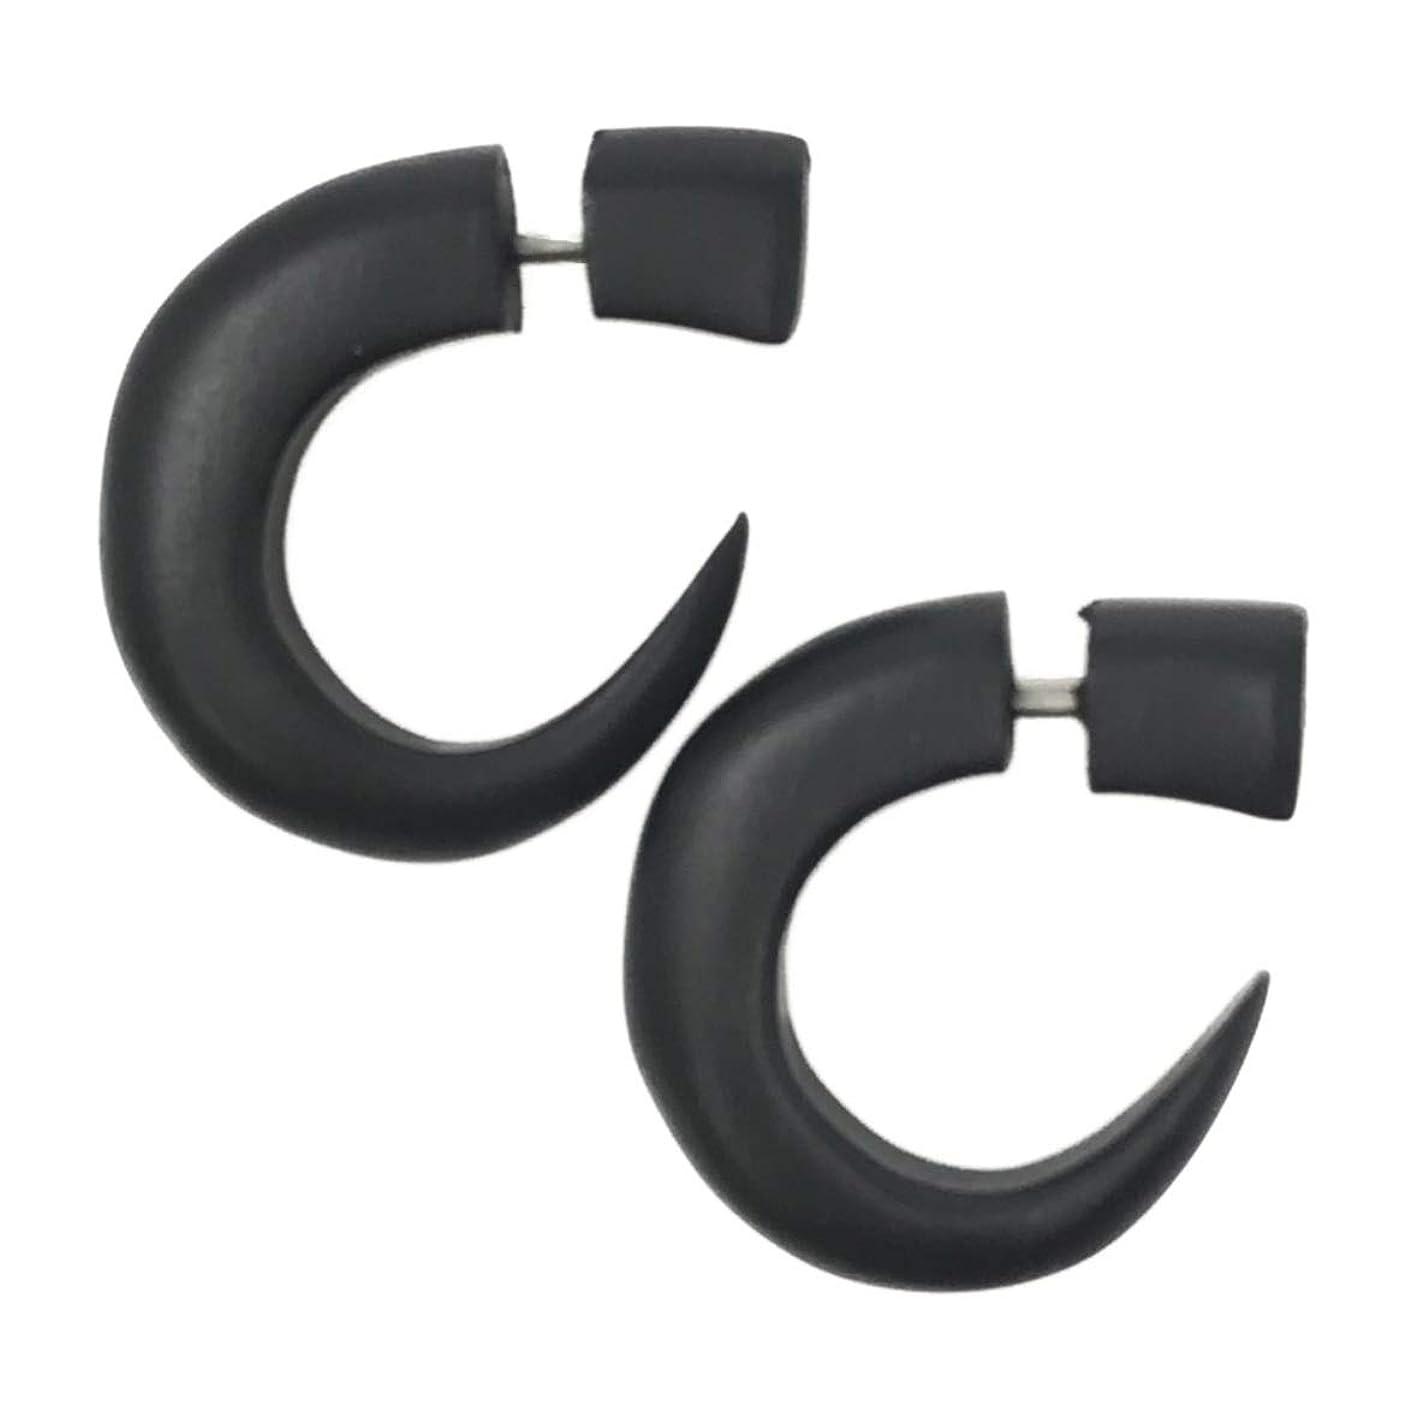 UMBRELLALABORATORY Tribal Organic Wooden Earrings Fake Gauges Sold As Pair Bohemian Jewelry Beach Tropical Tattoo bhzwzihzpds680